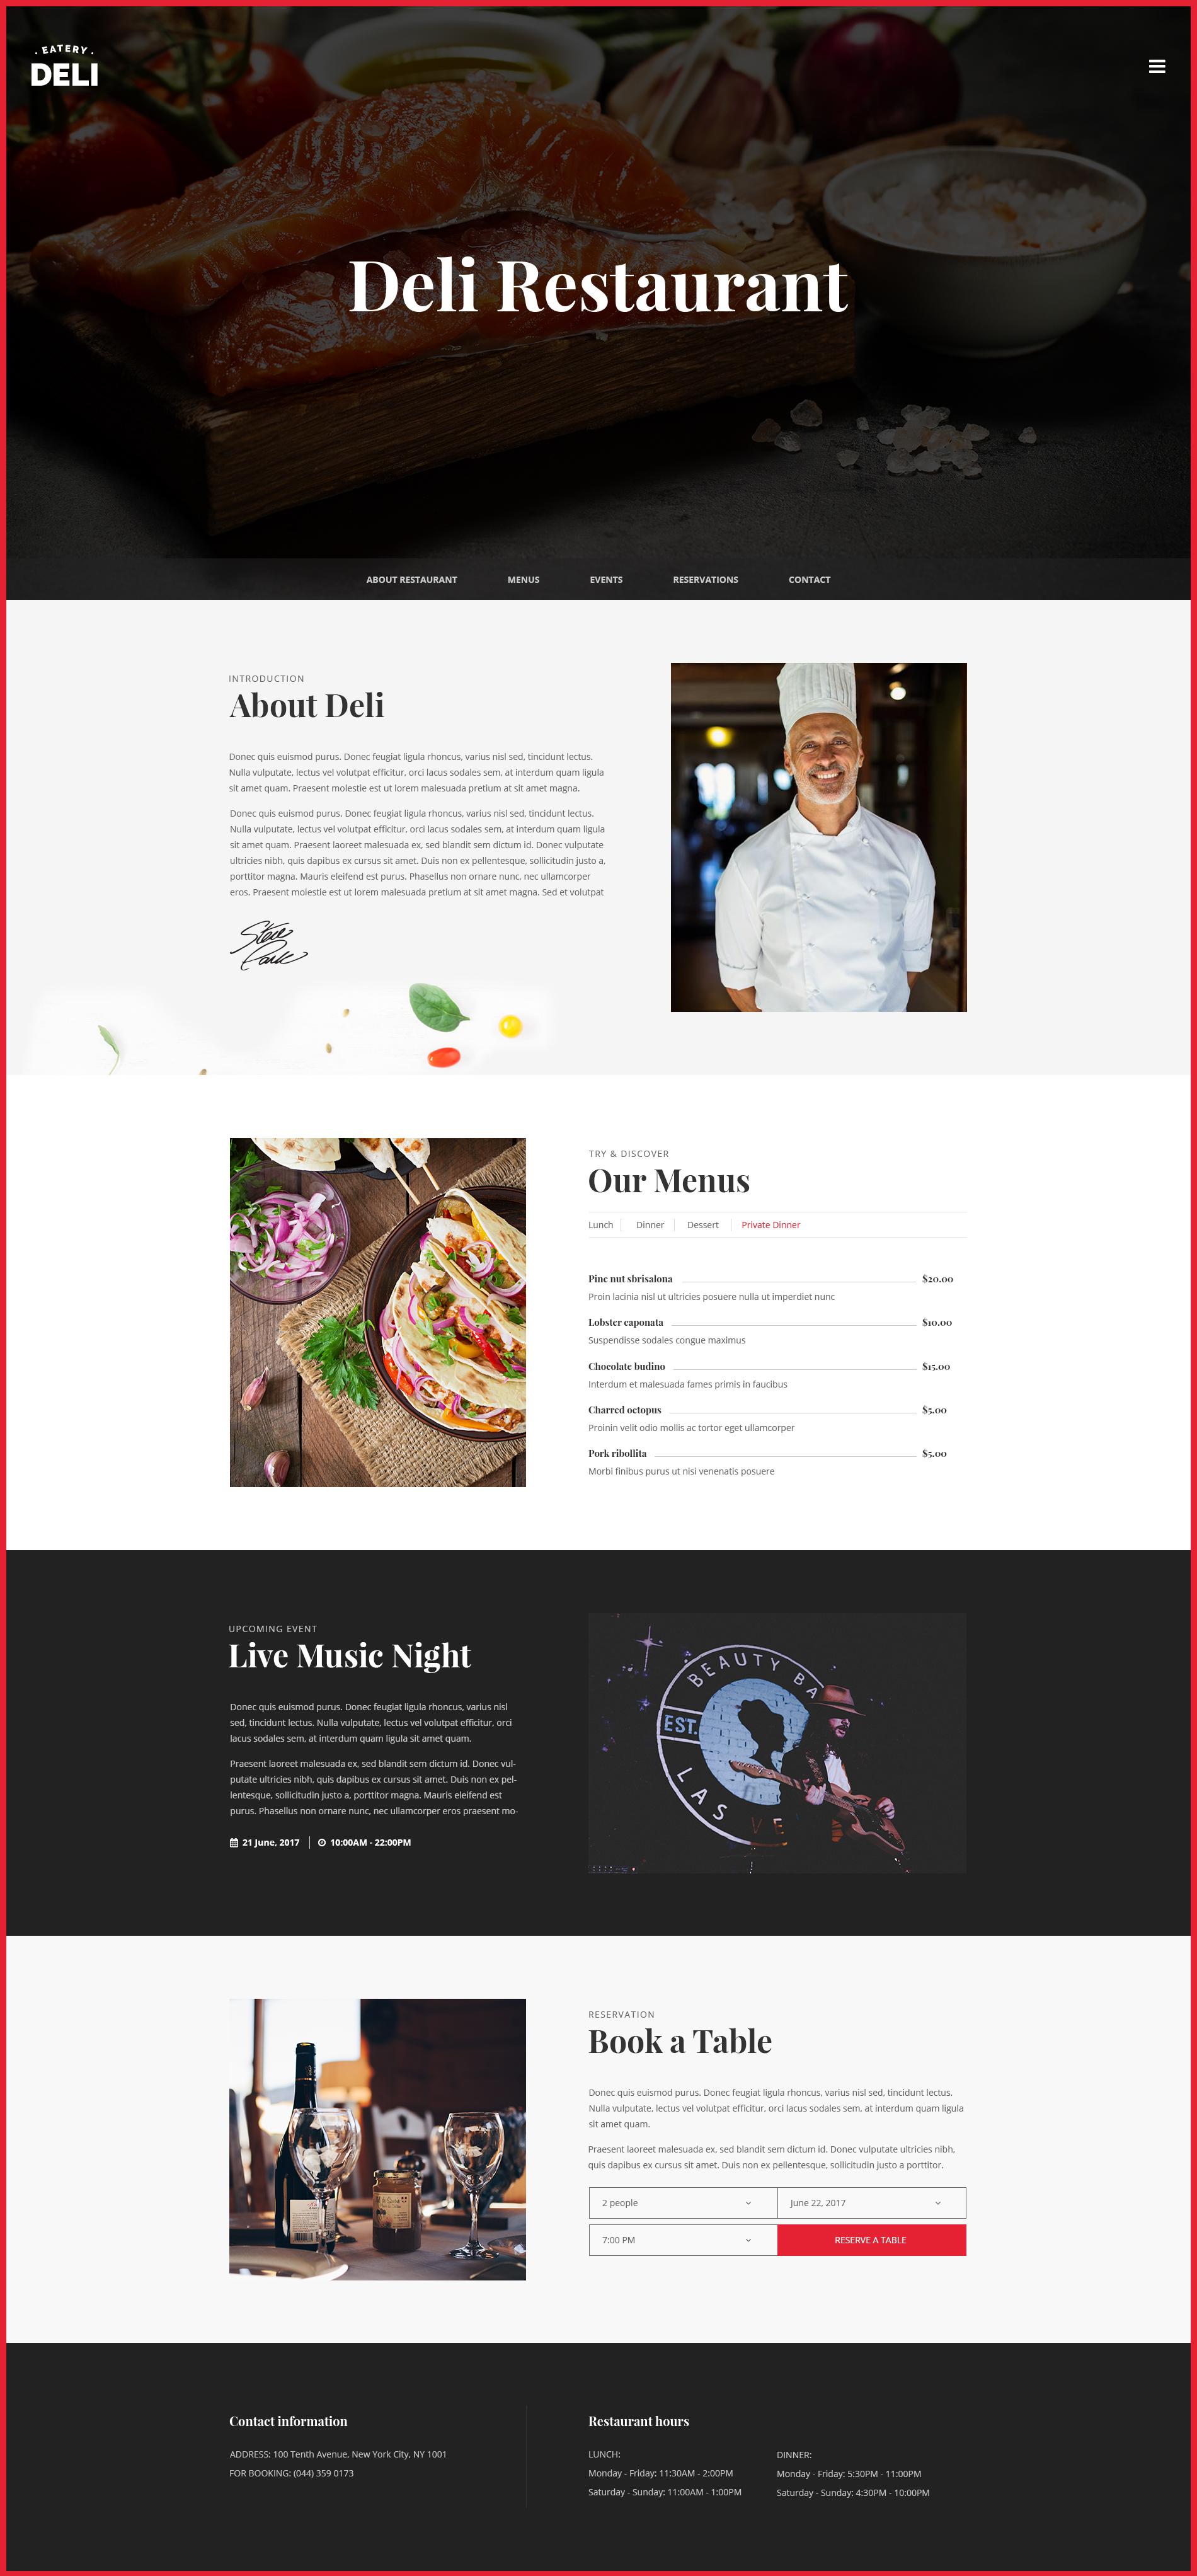 Deli Restaurant Restaurant Psd Template By Designgalaxy8